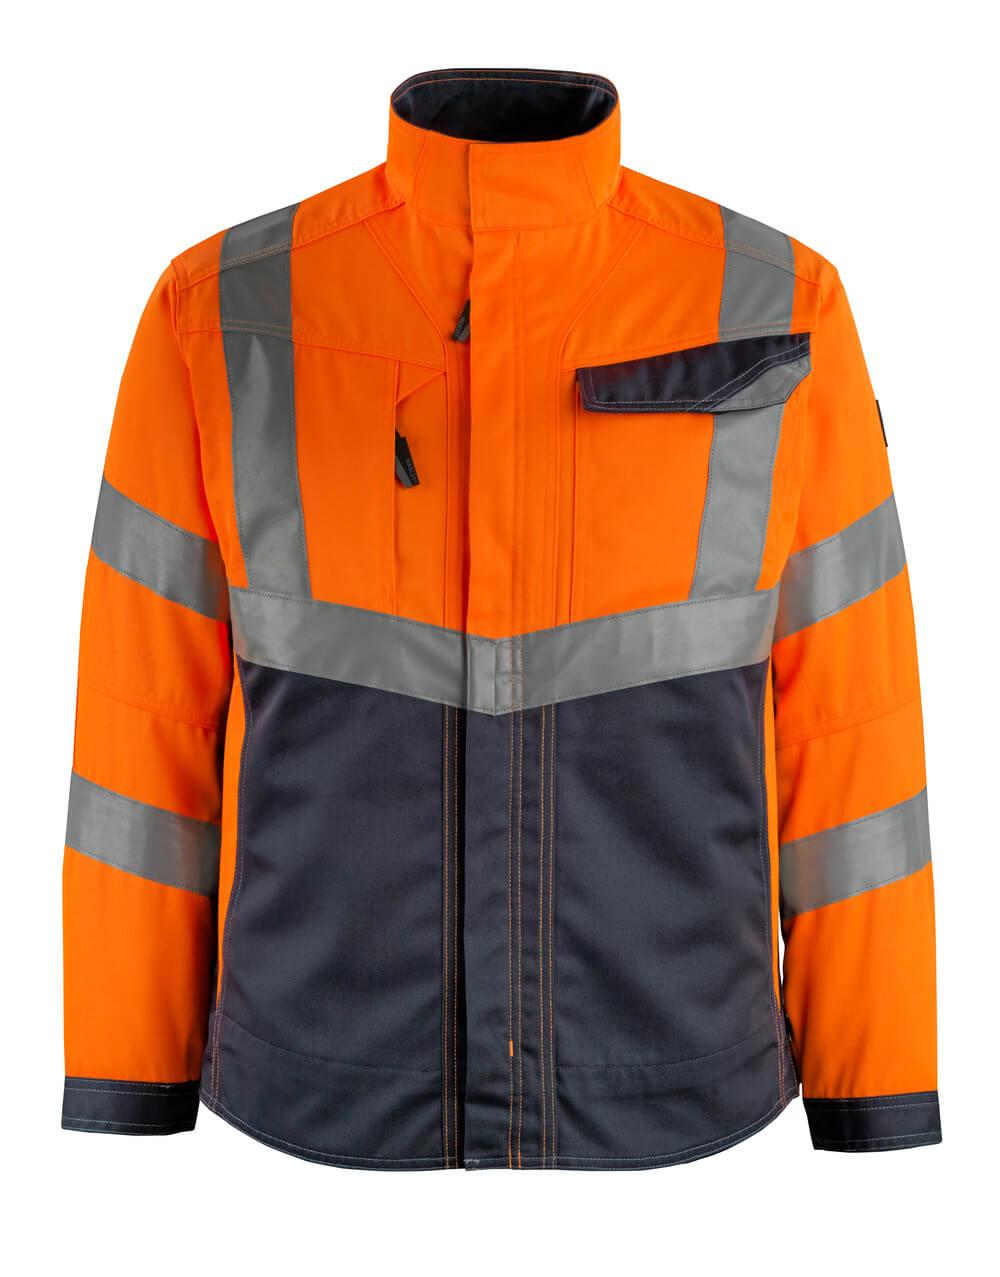 15509-860-14010 Jacket - hi-vis orange/dark navy